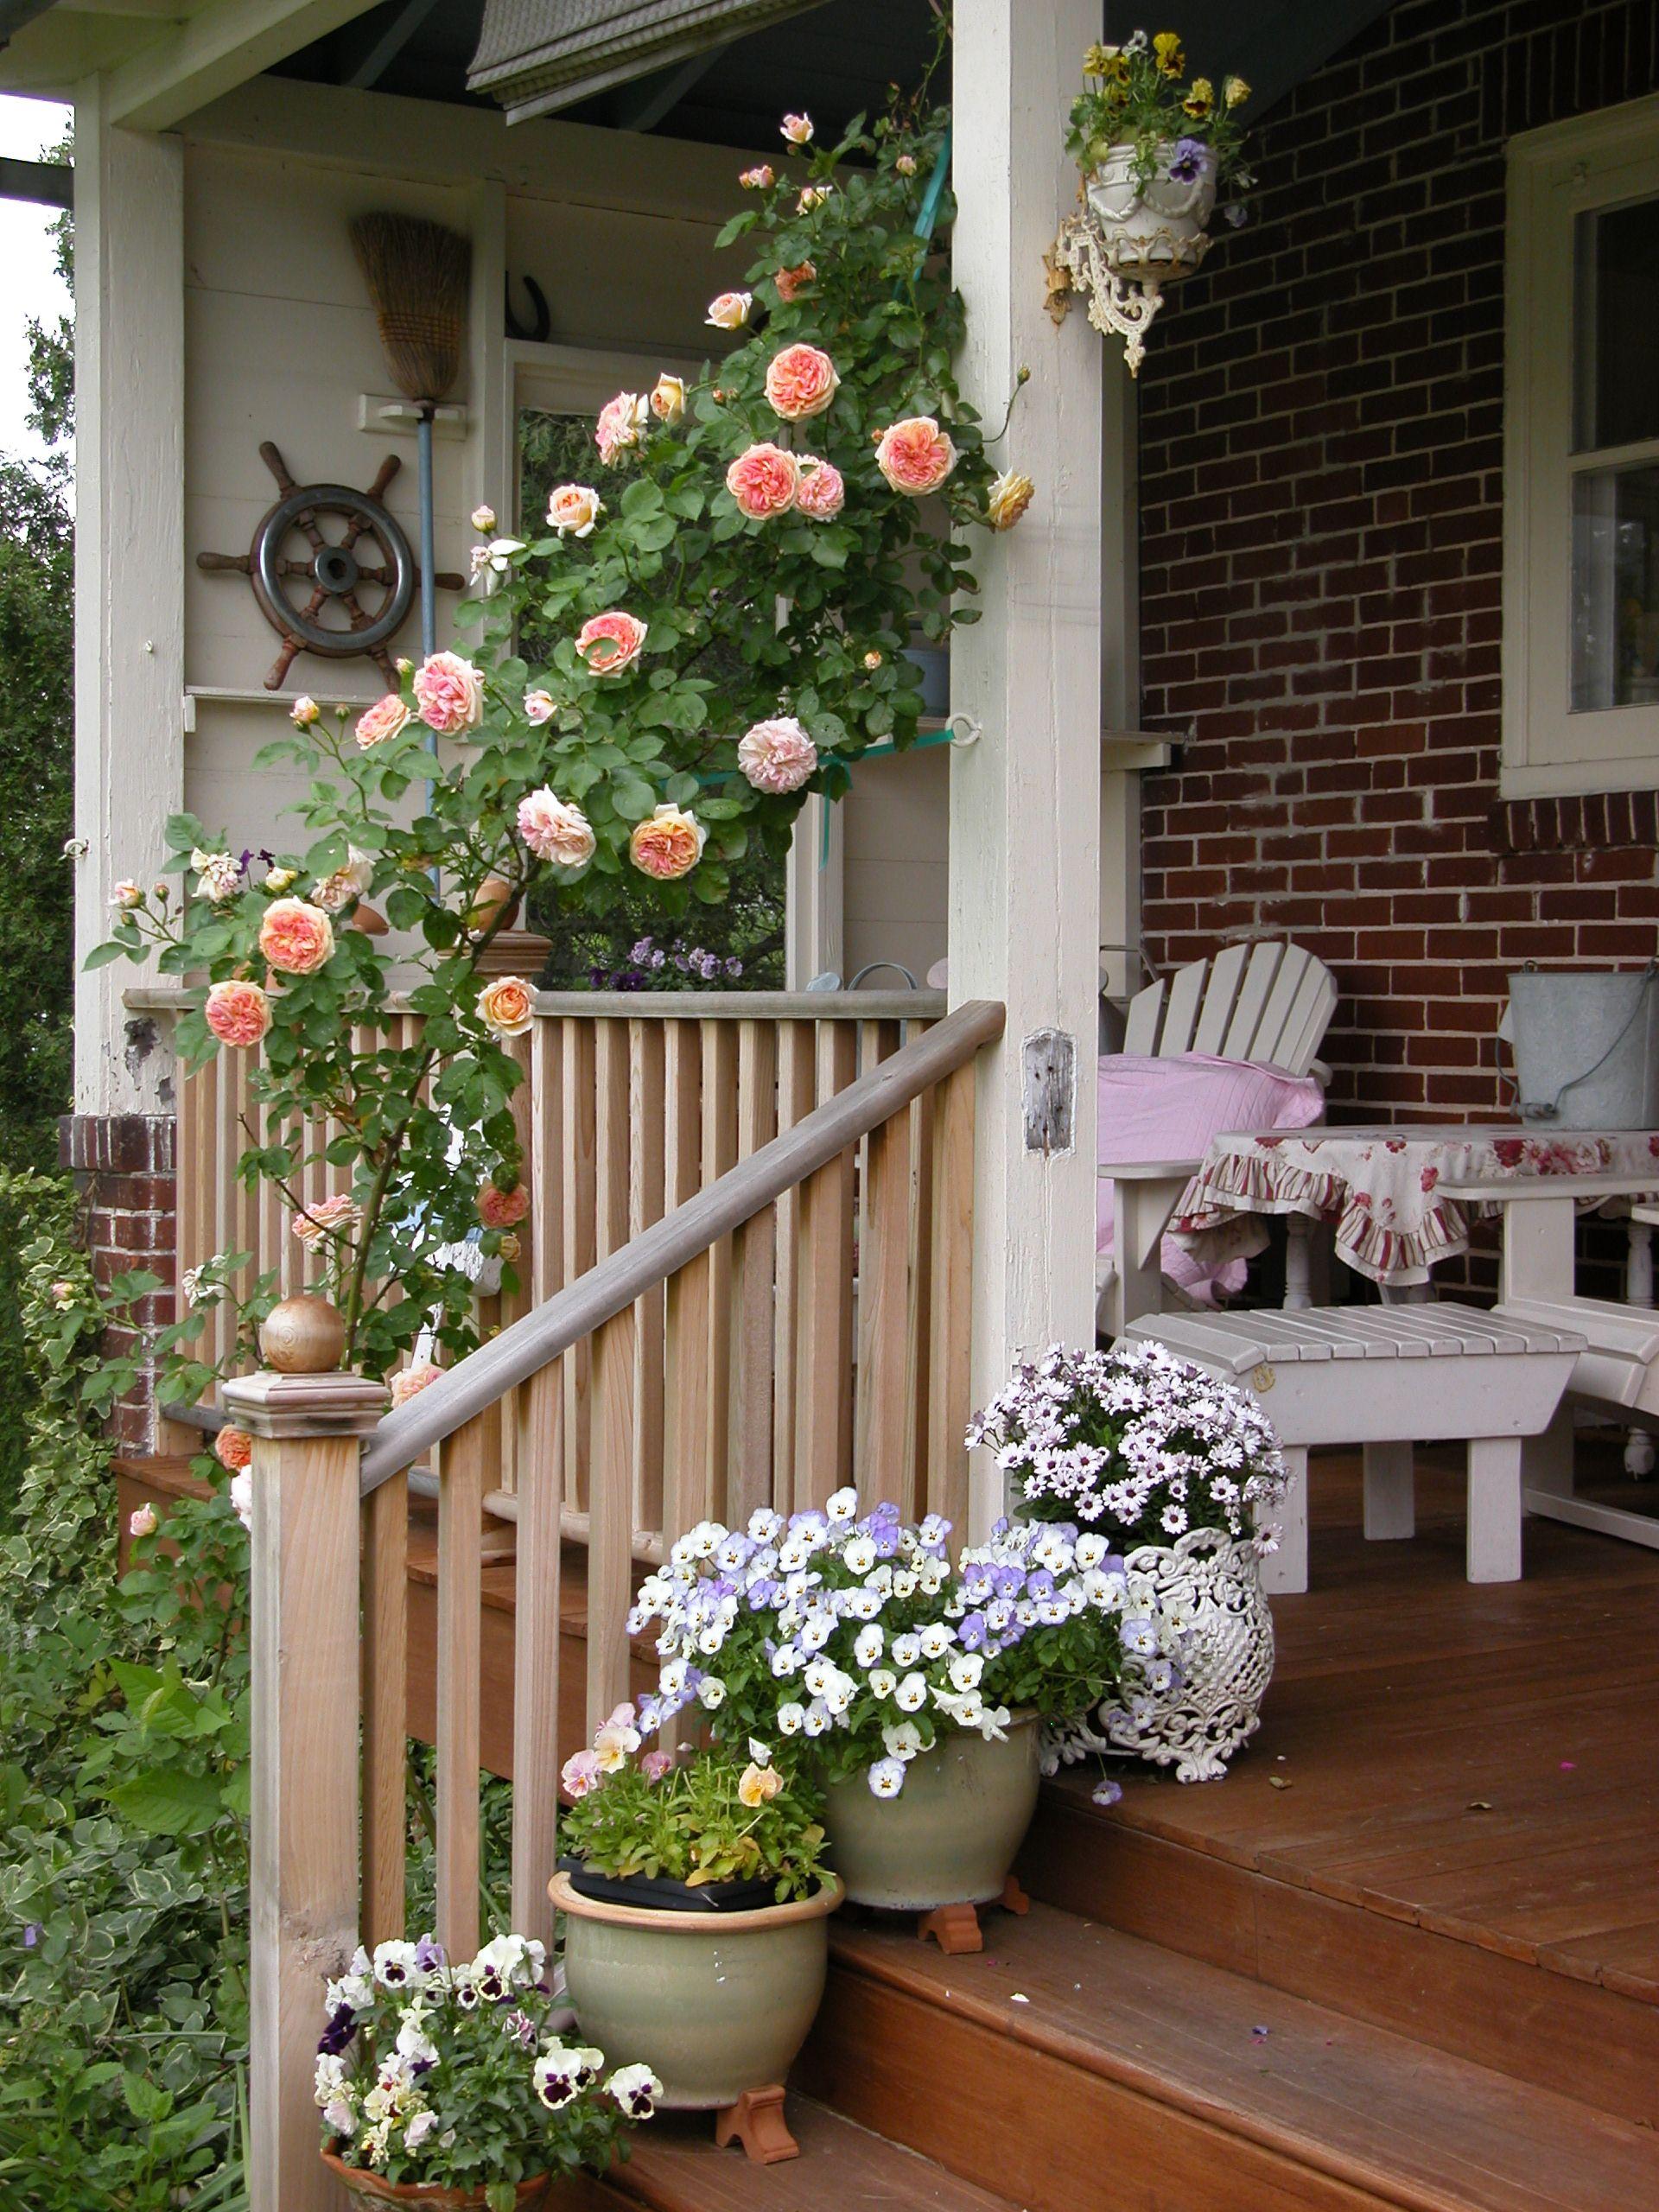 Cute Porch Love The Climbing Roses Porch Ideas